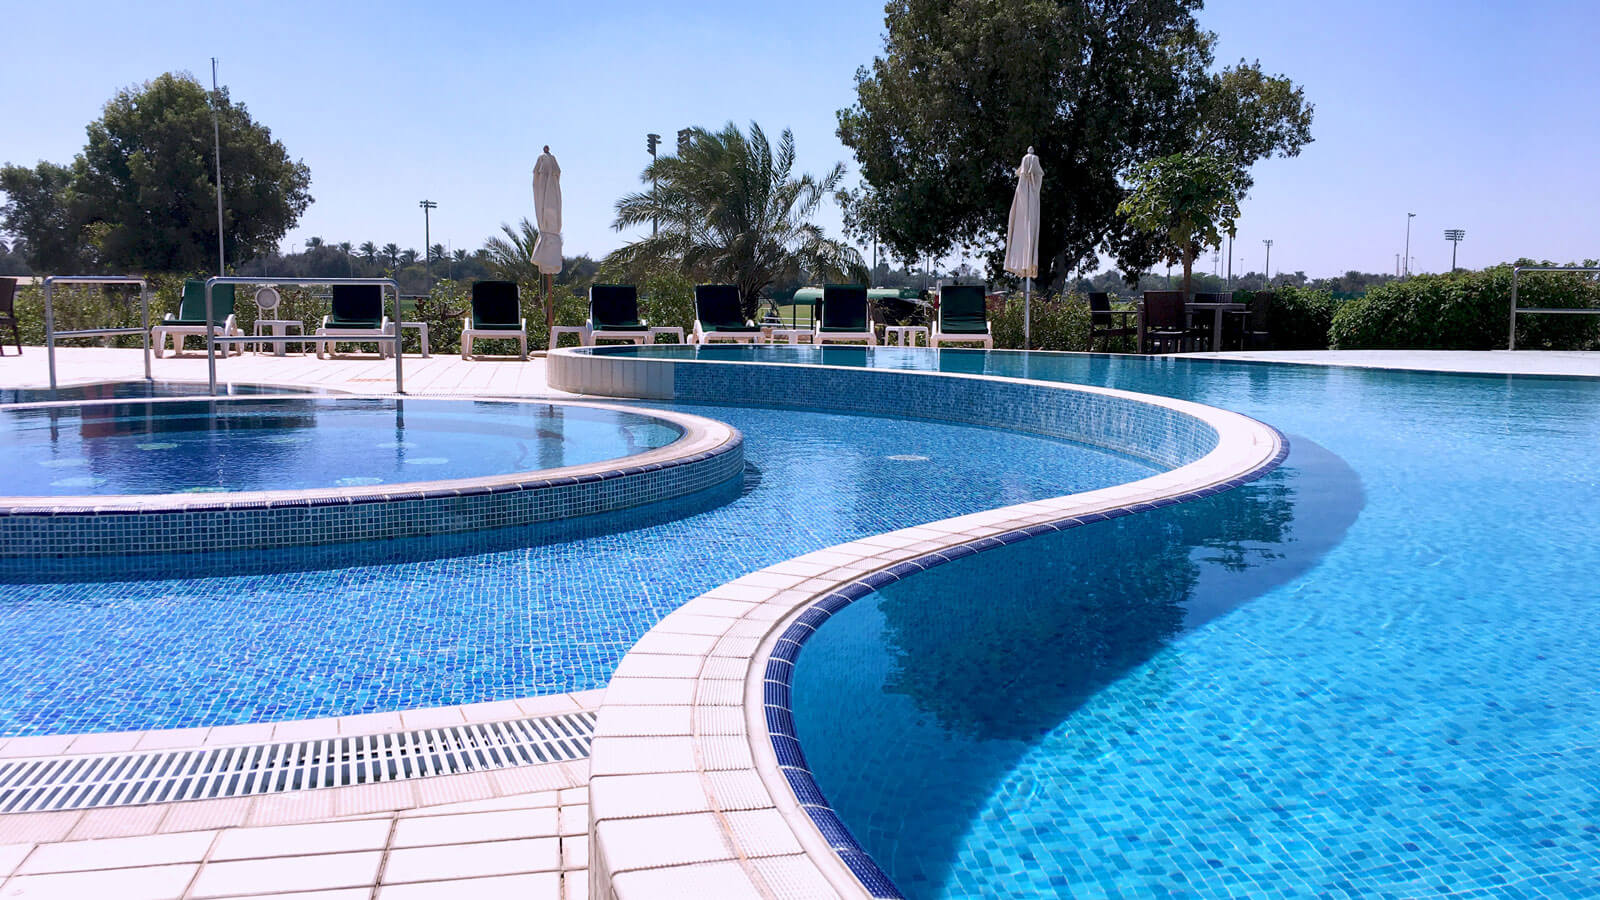 pool-2-abu-dhabi-city-golf-club.jpg